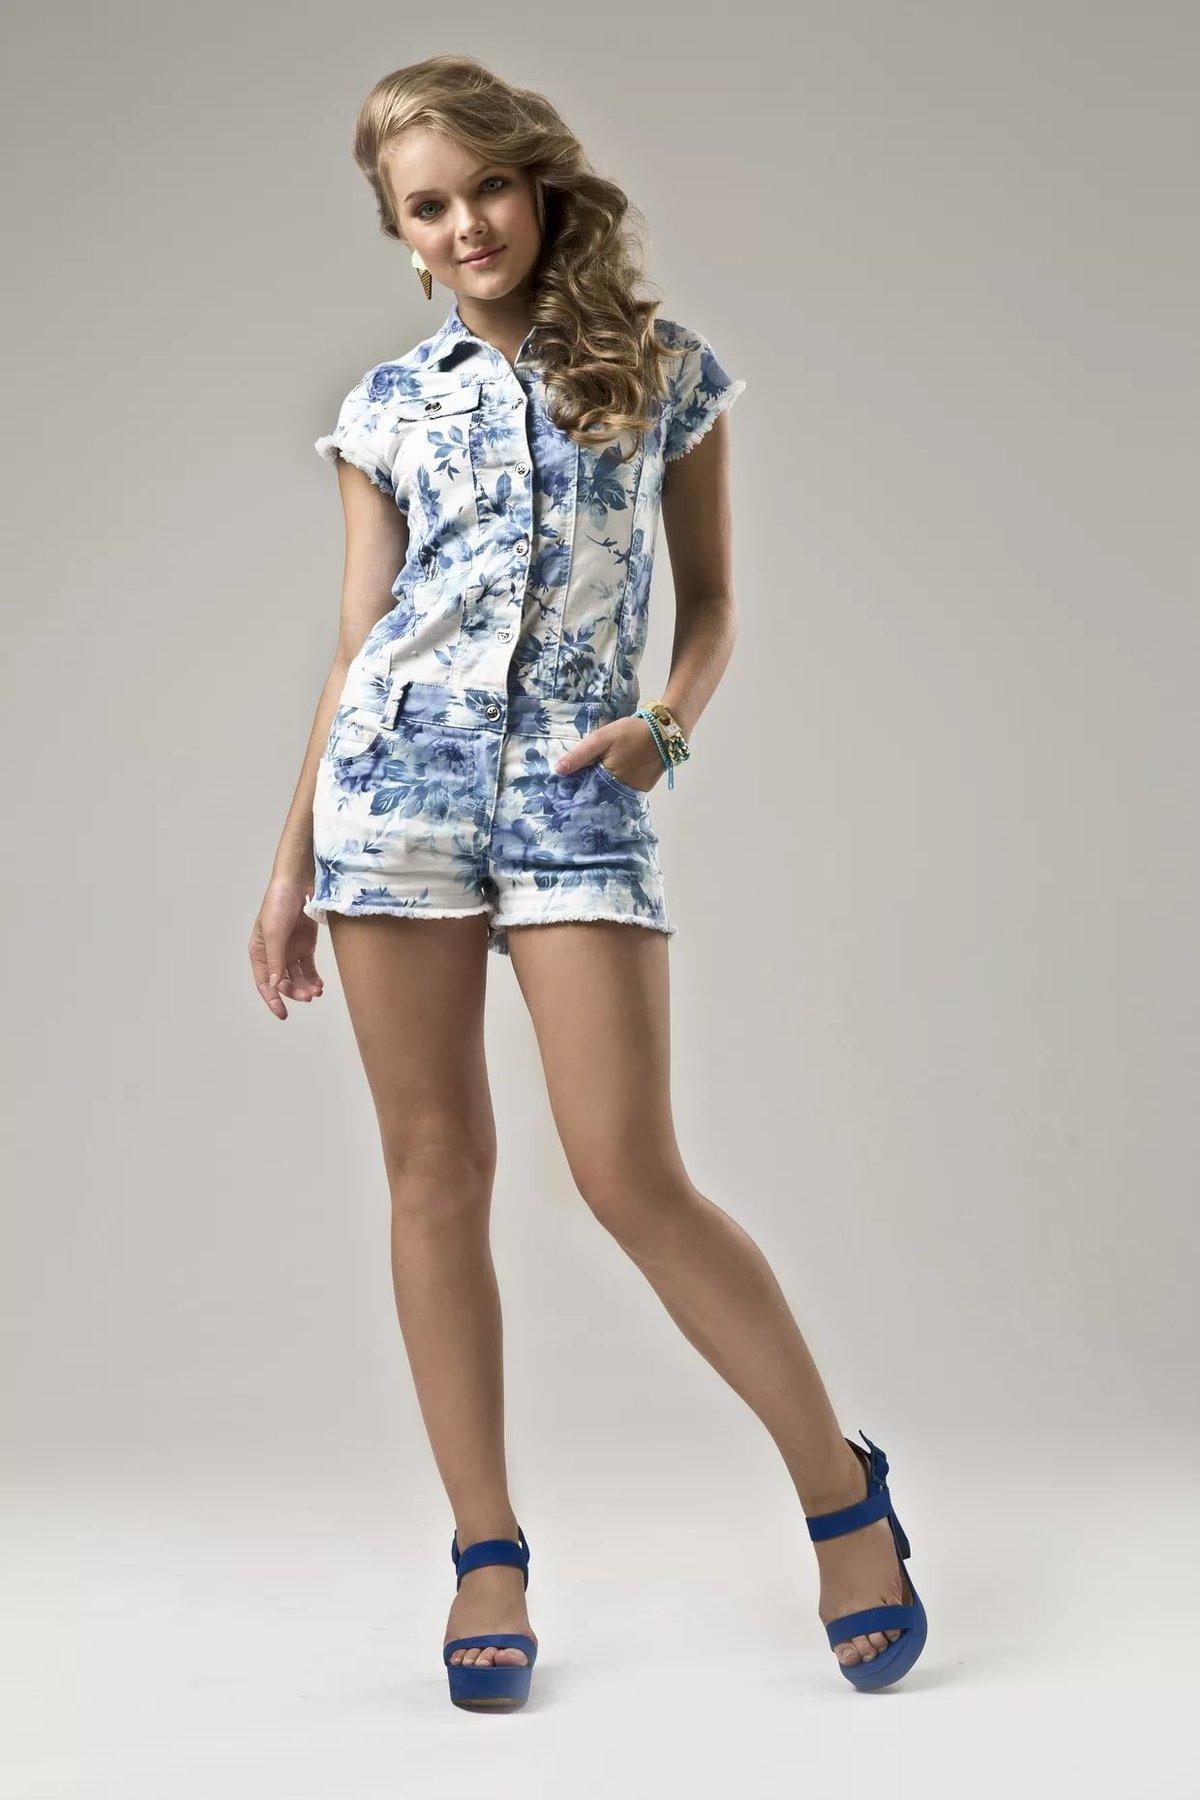 teens-girls-clothing